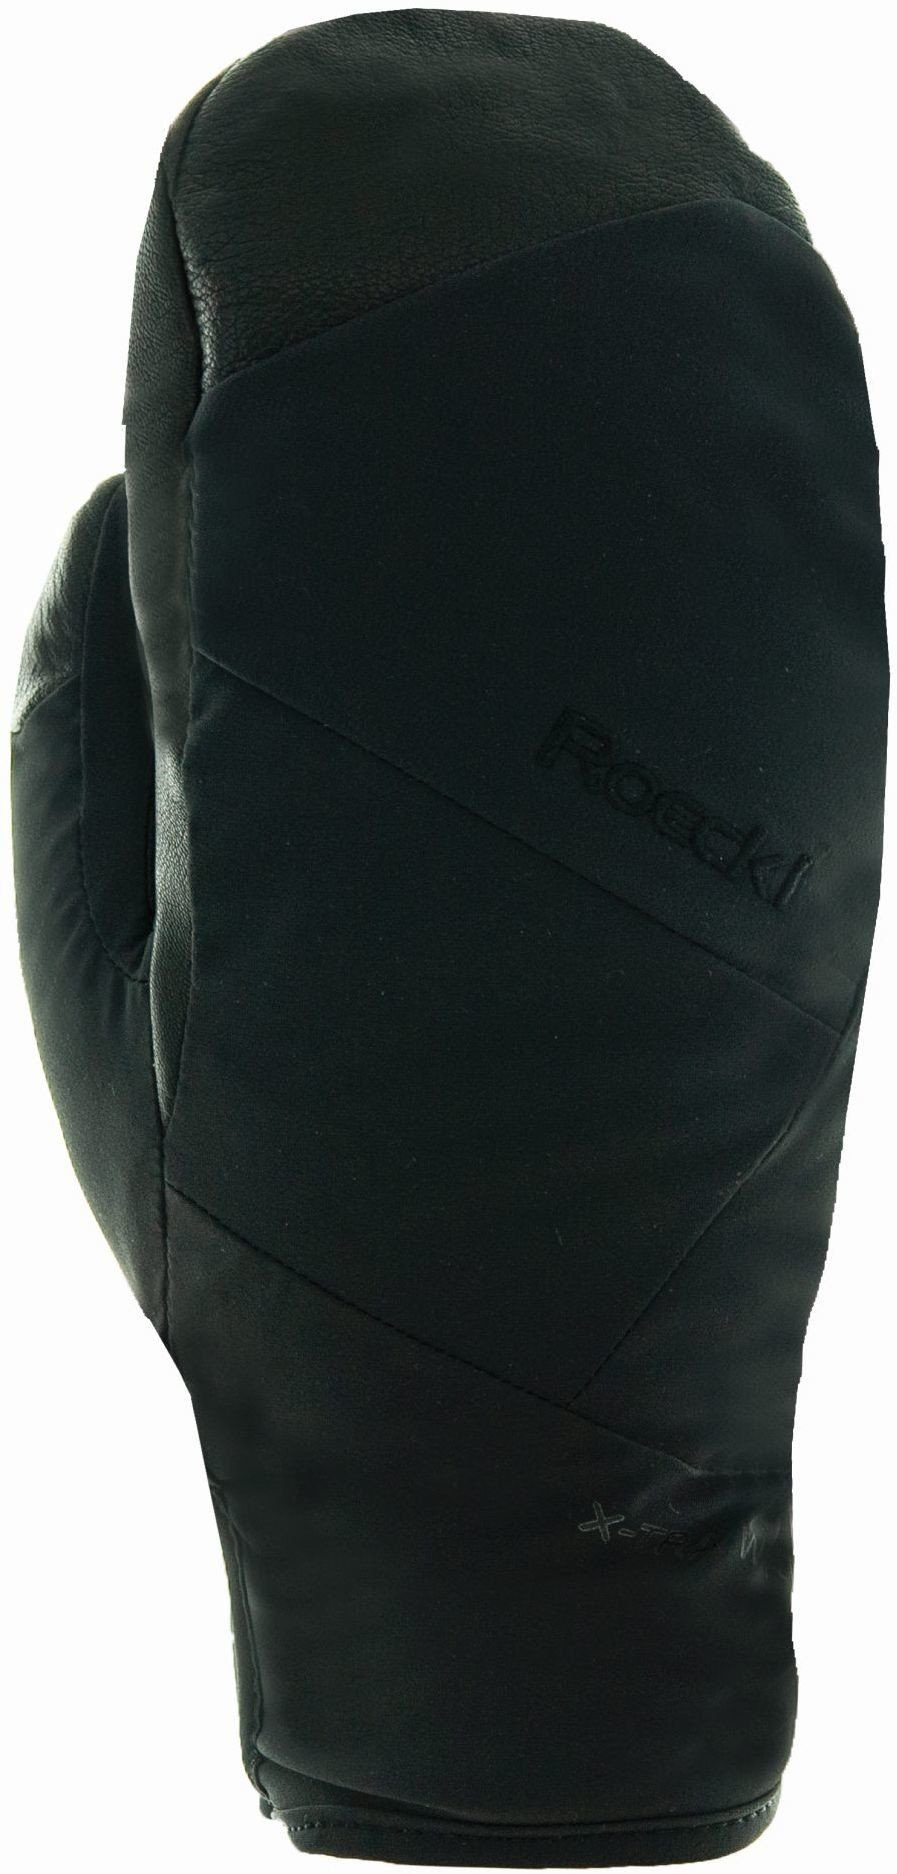 Unisex Roeckl Handschuhe »Stuben GTX Handschuhe Herren« schwarz   04044791658084